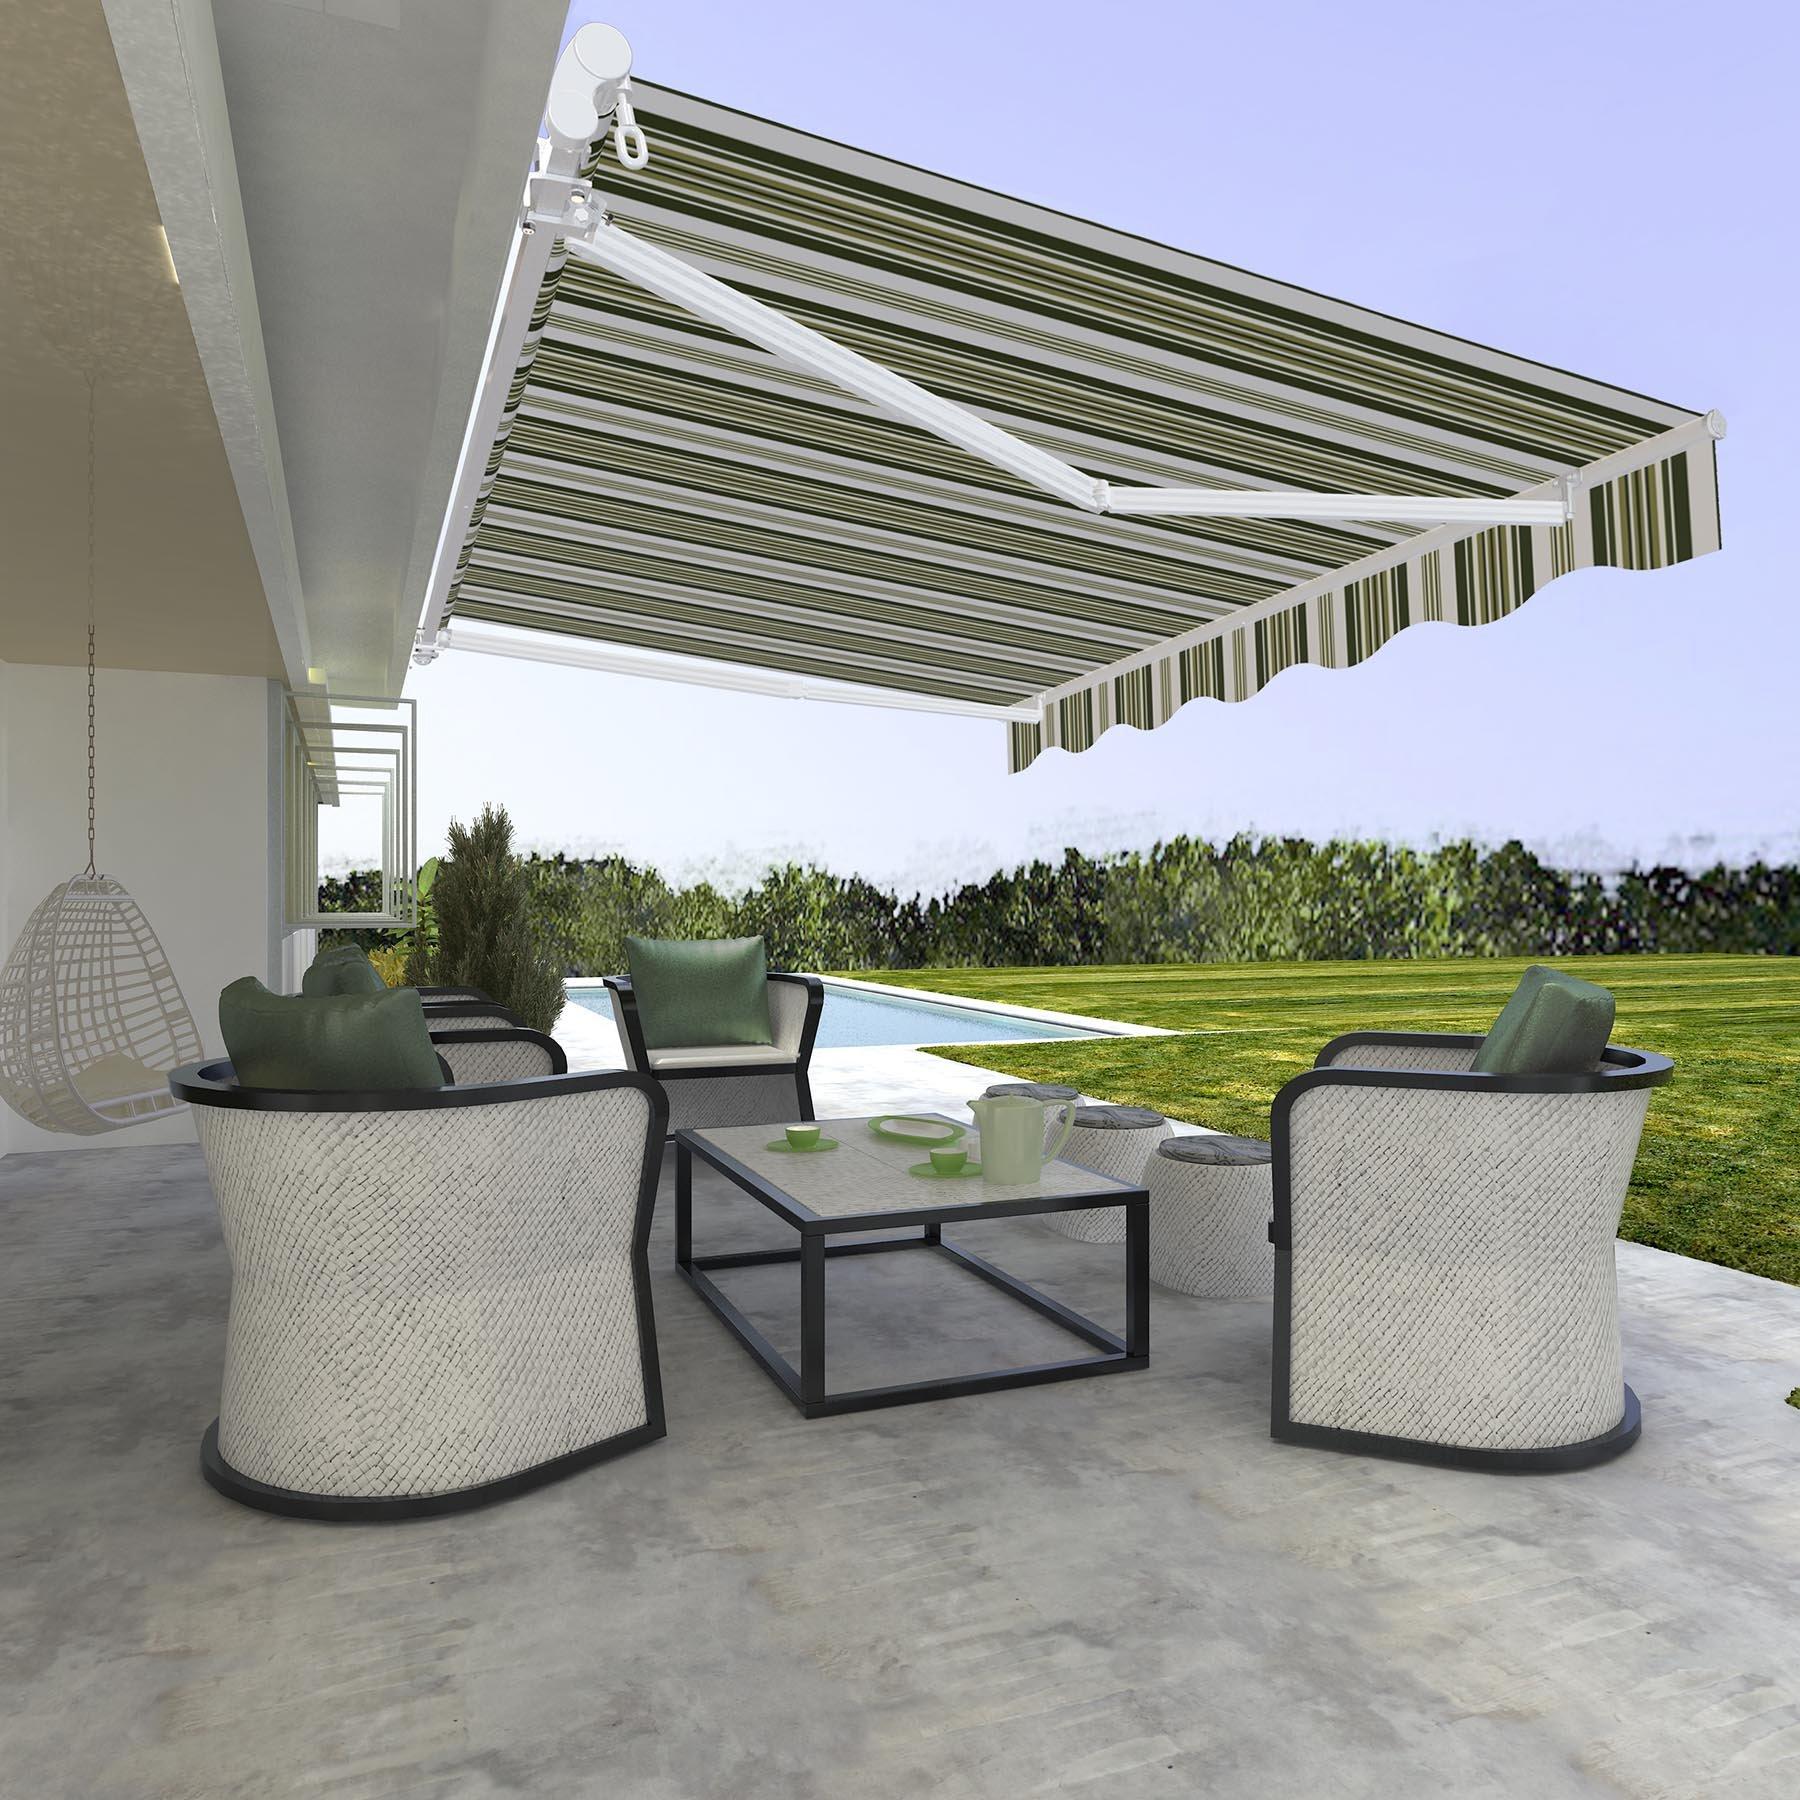 CO-Z Manual Patio Shade Retractable Deck Awning Sun Shade ...